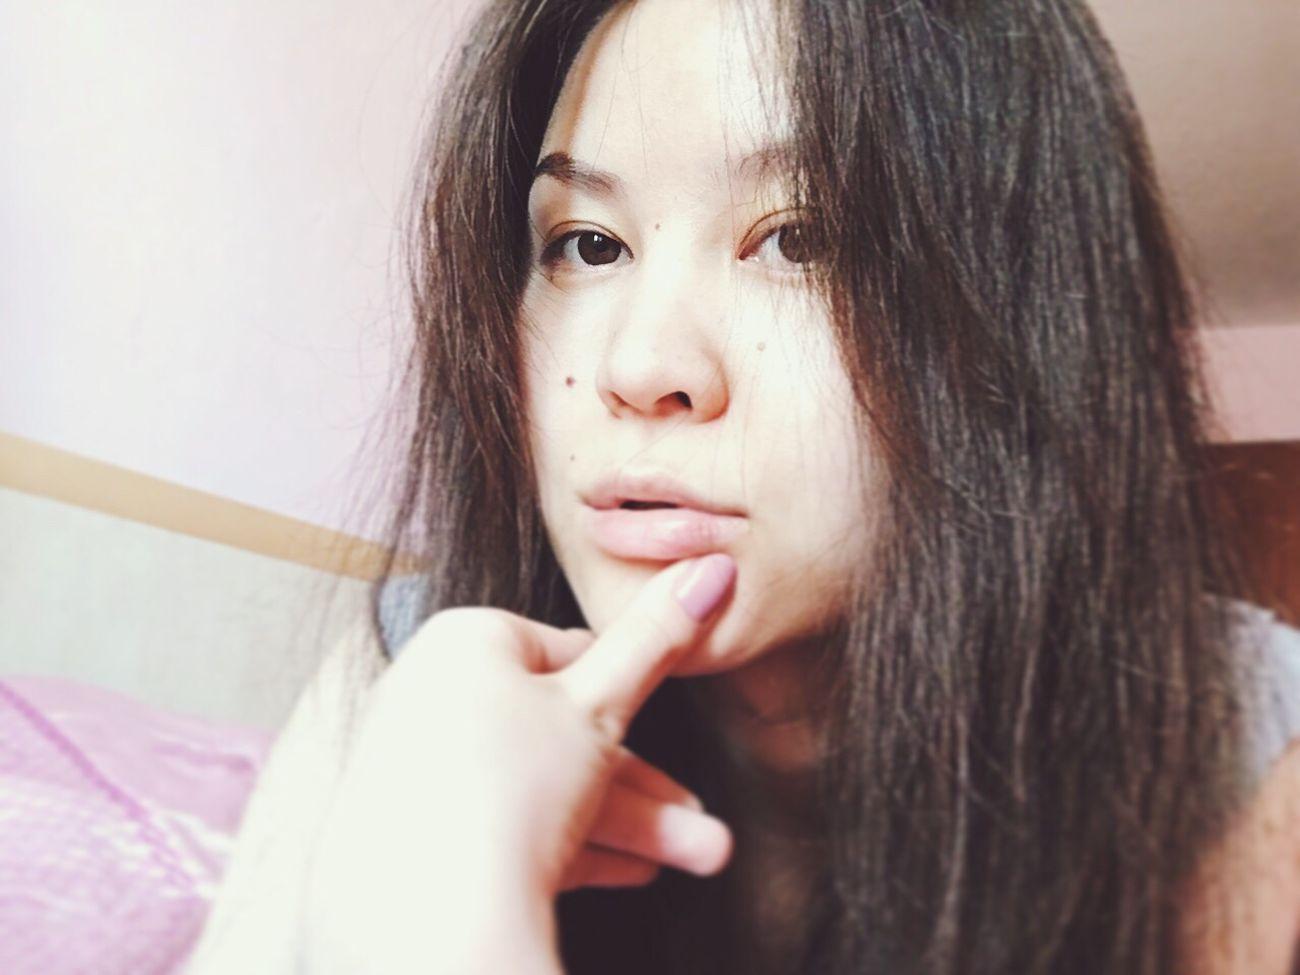 Hello World Pic EyeEm Me Picture Eye Photo Photography Me 😊😂 Open Edit Asian Girls KazakhGirl Eyem Gallery Selfie ♥ First Eyeem Photo Smartphone Photography Profile Photo Kazakhstan Kazakhstan Girls Taking Photos Hello World EyeEm Best Shots Hi!